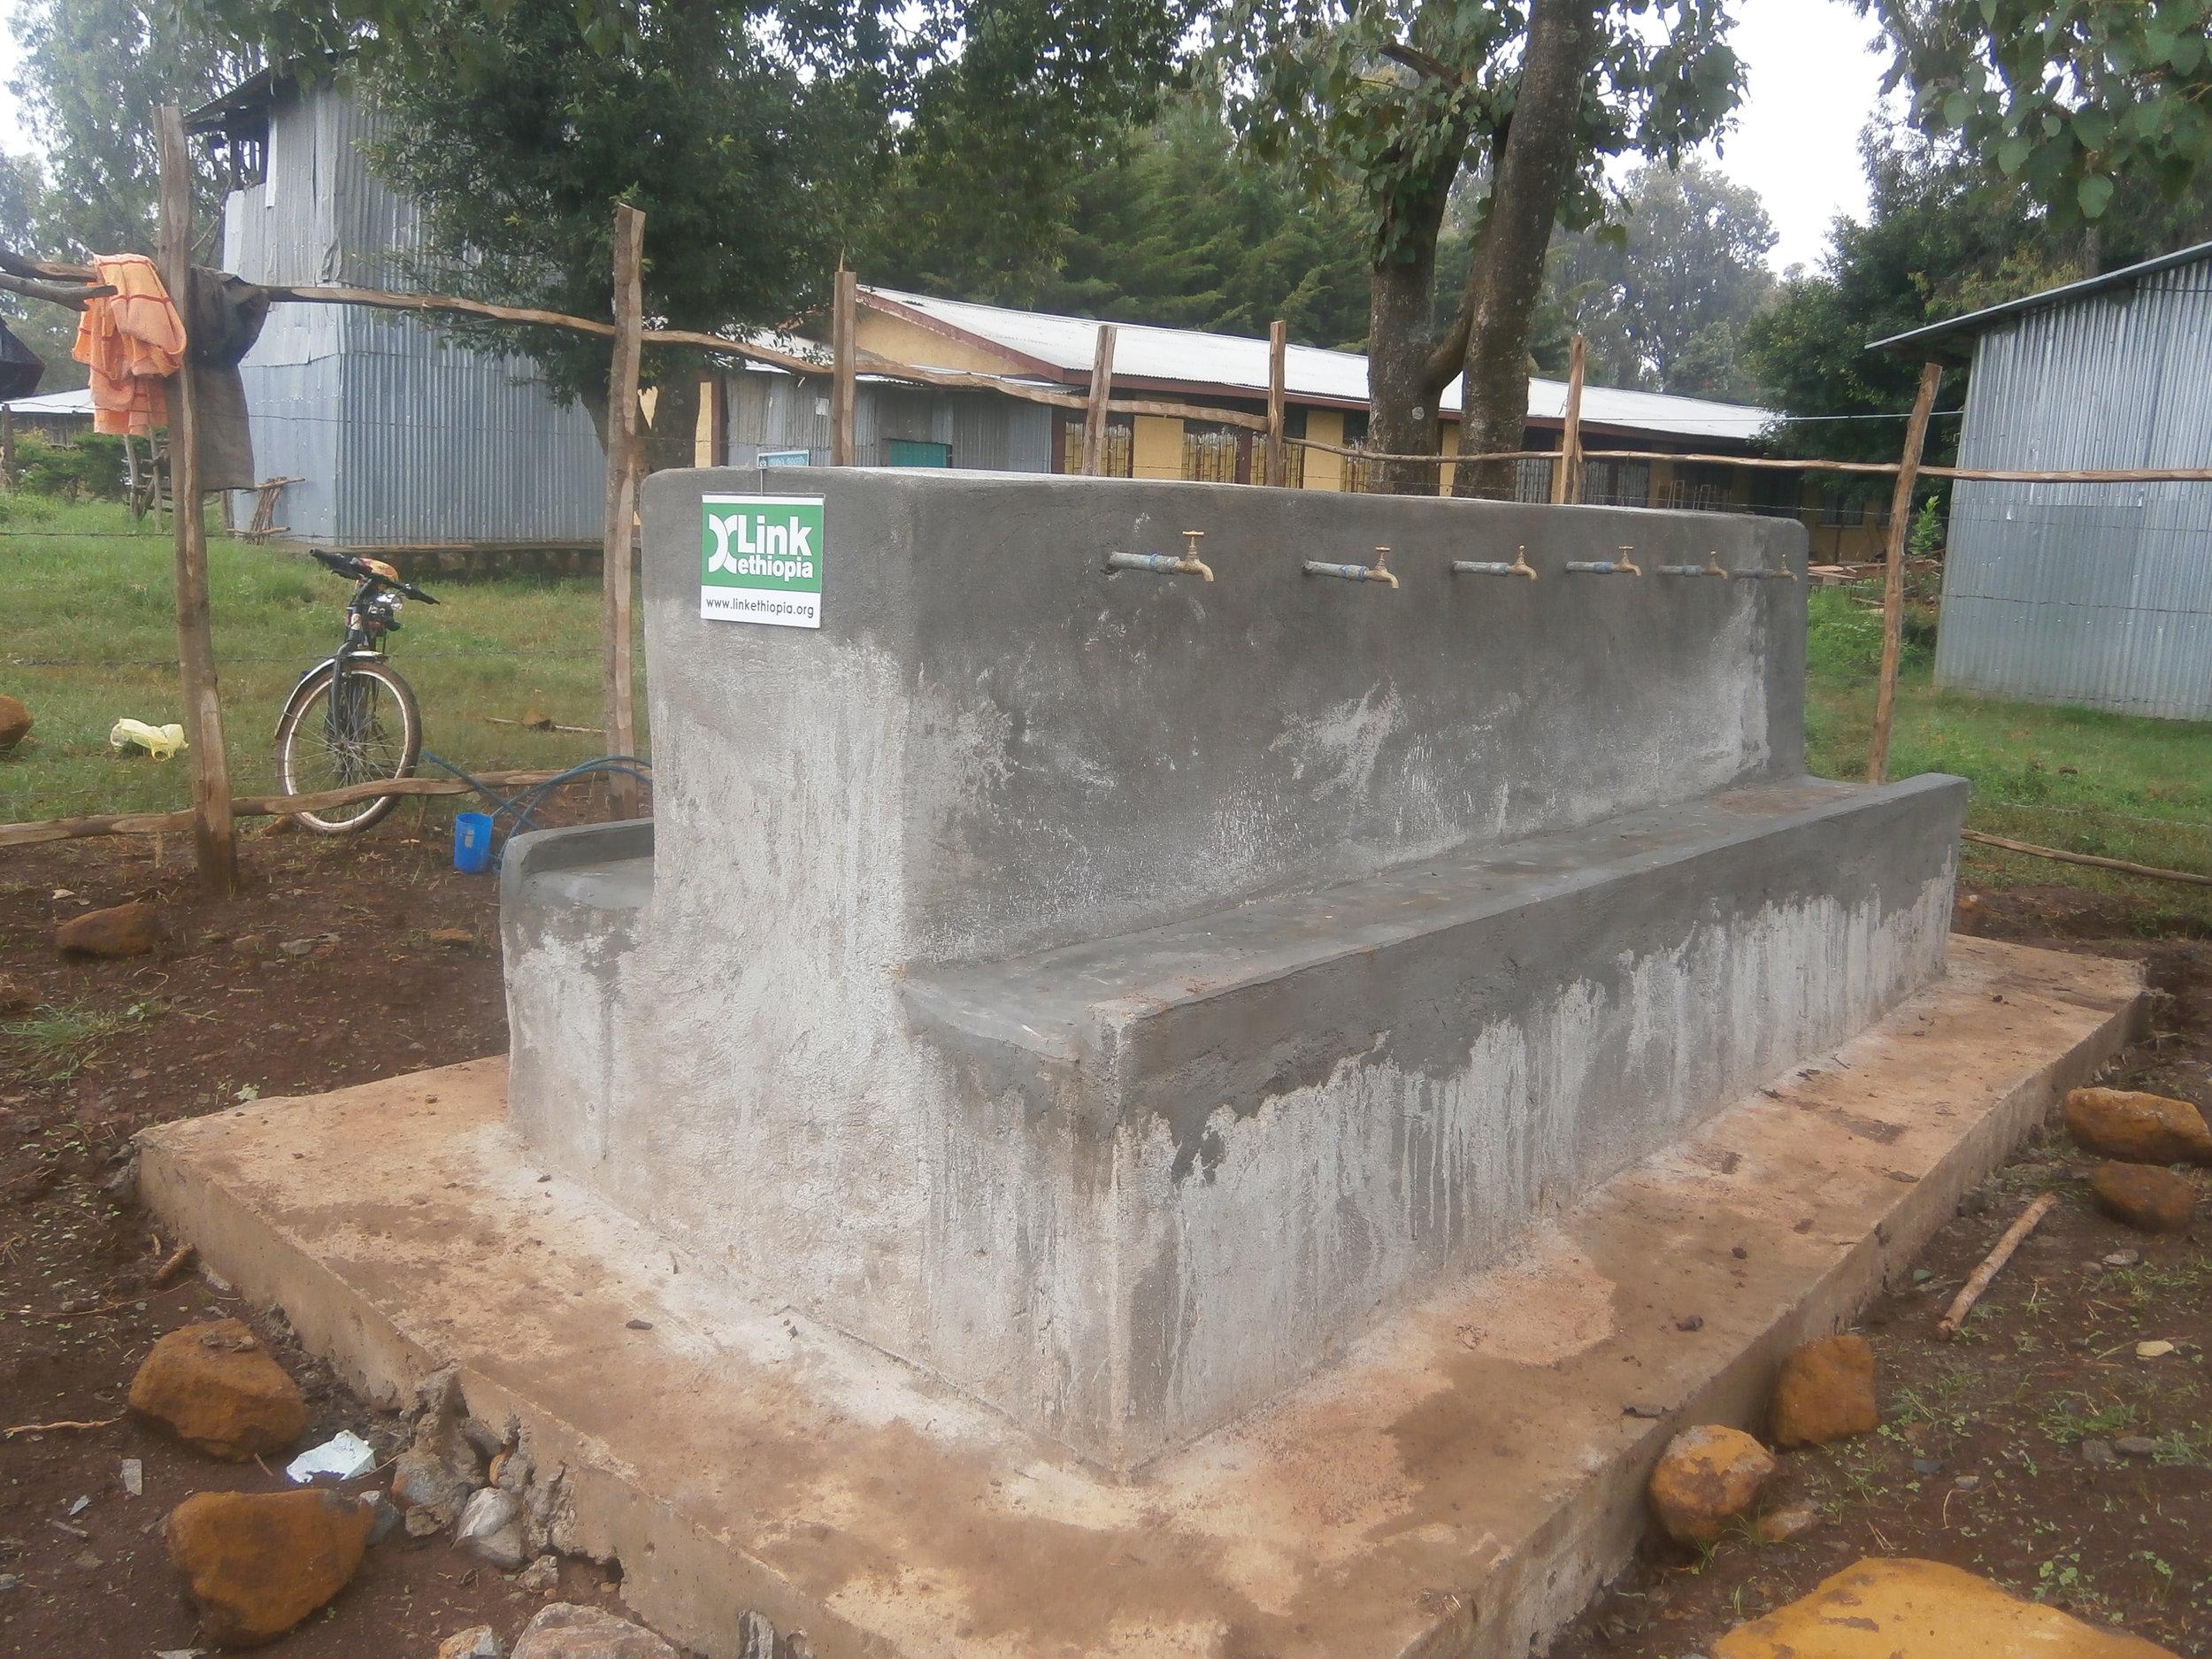 Aykel school 8 tap water station wash.JPG